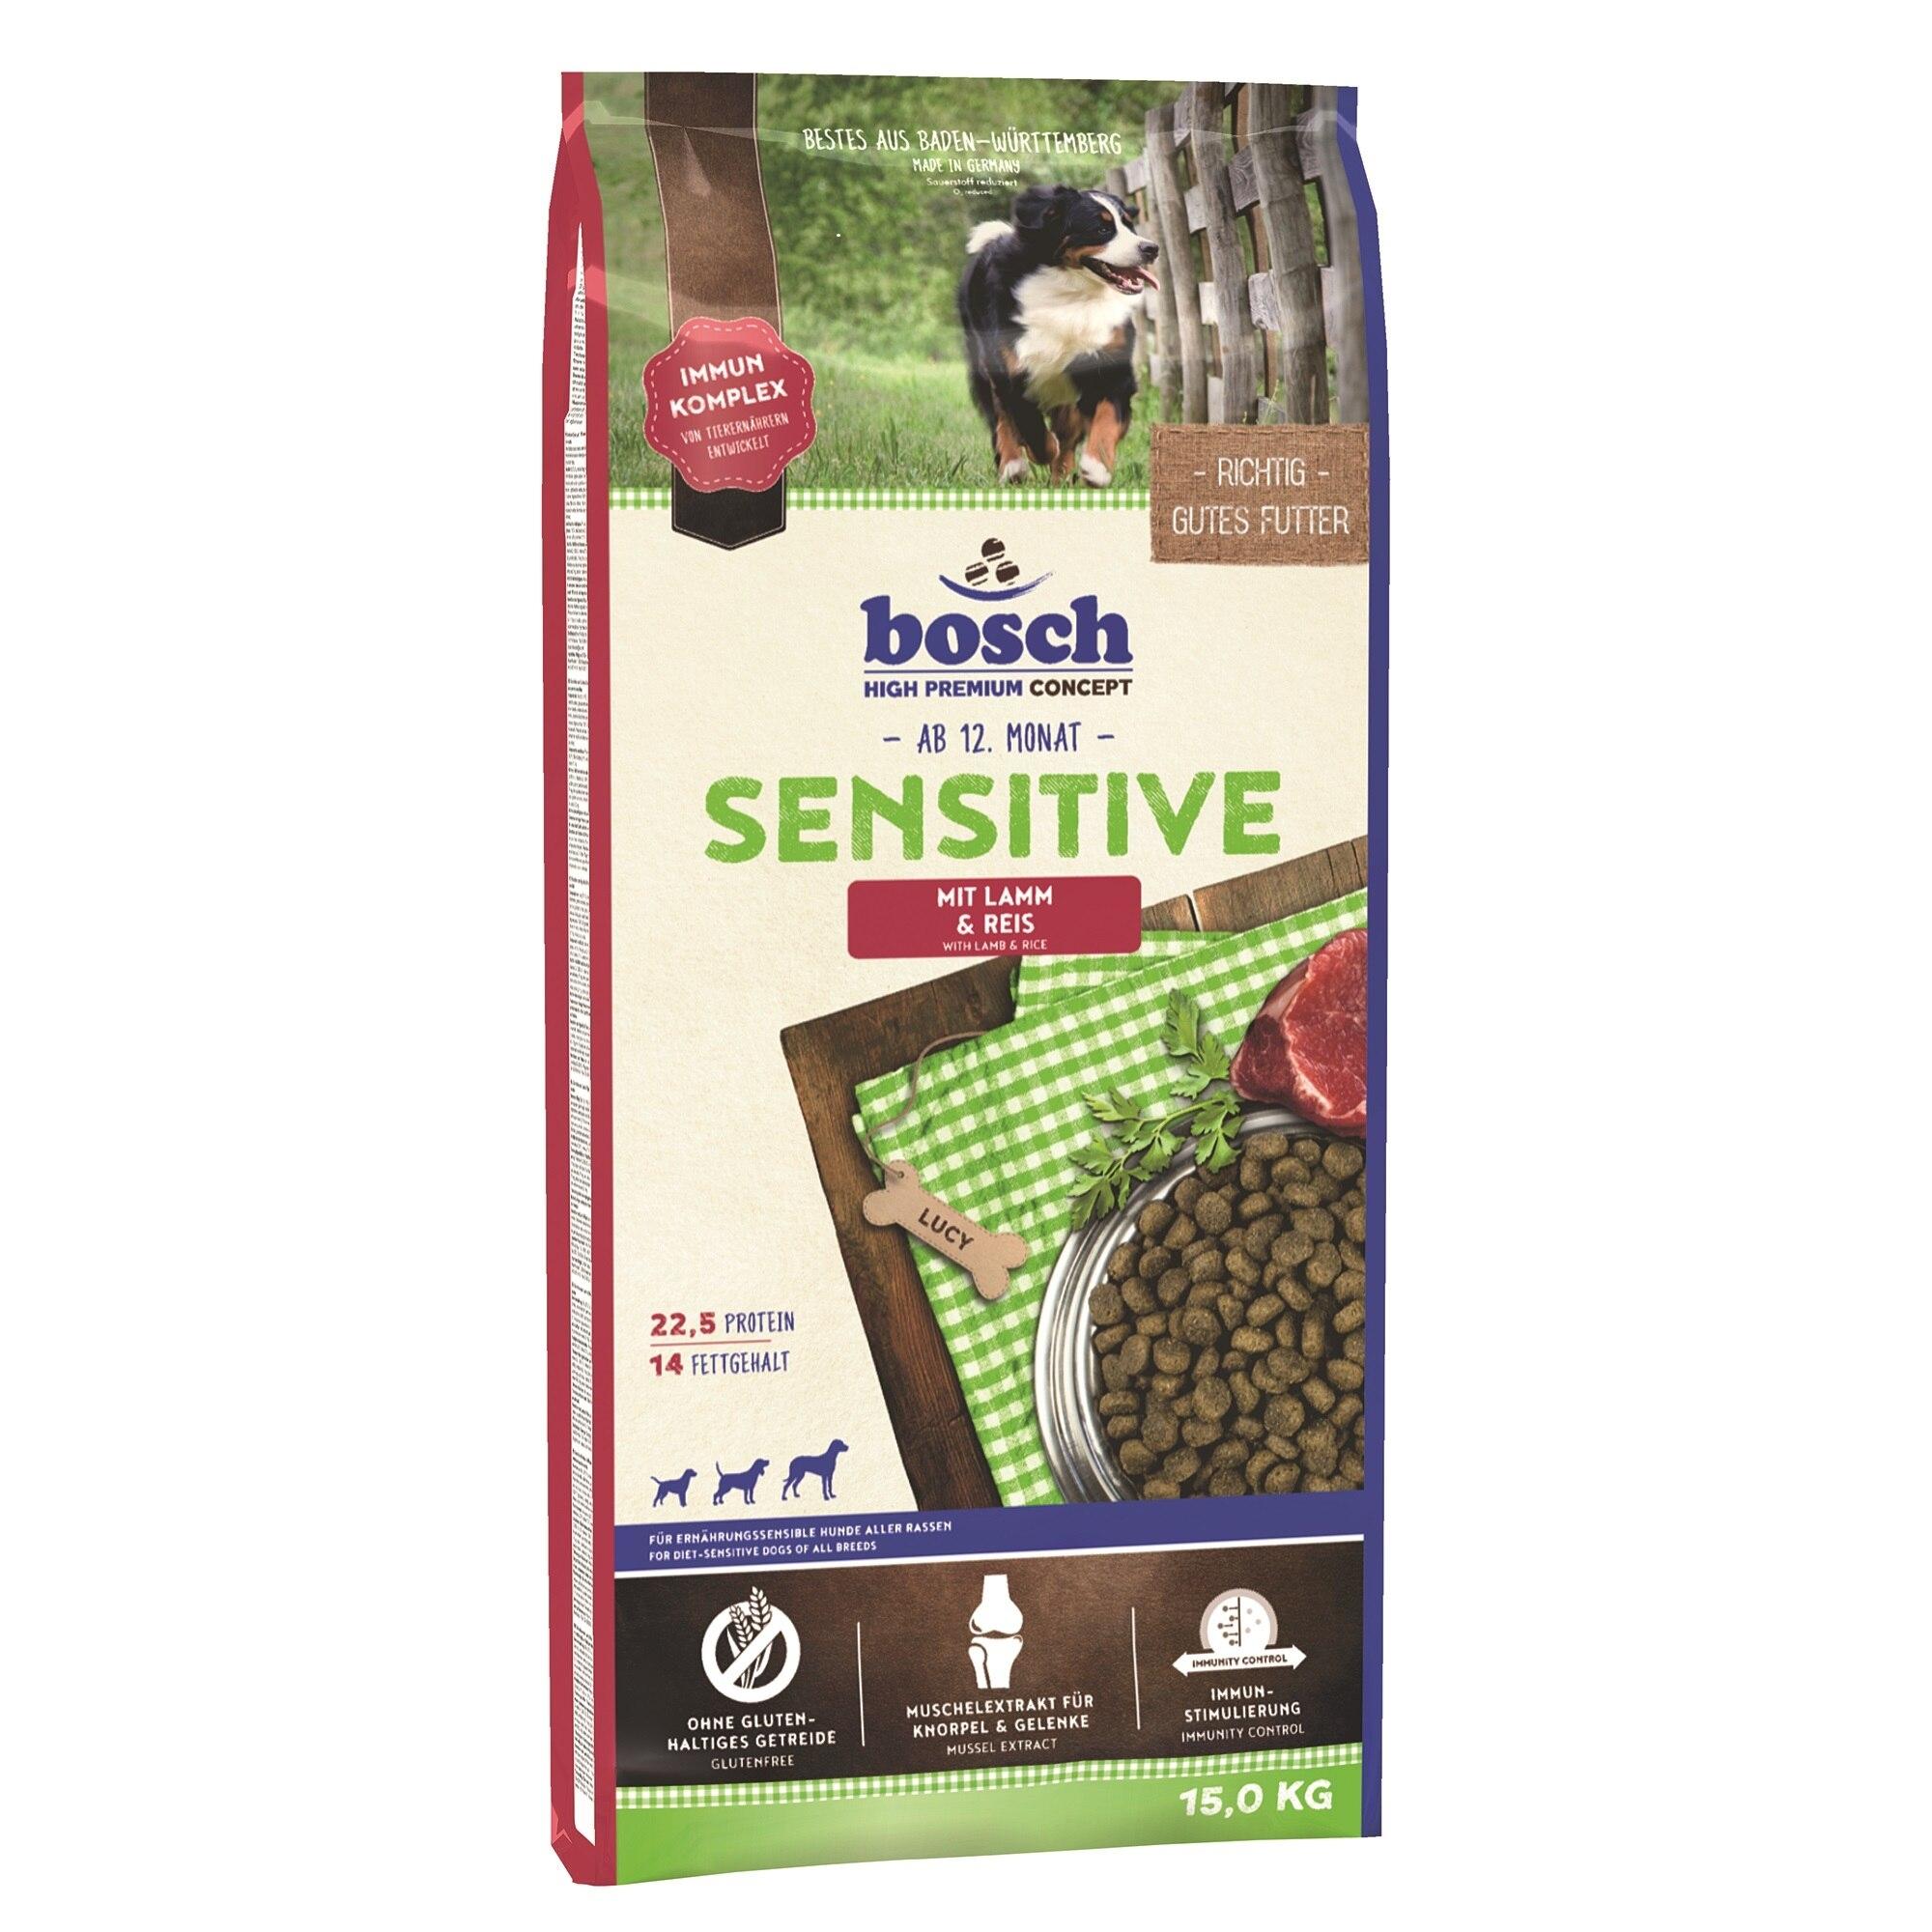 Bosch Sensitive, 15 kg imagine